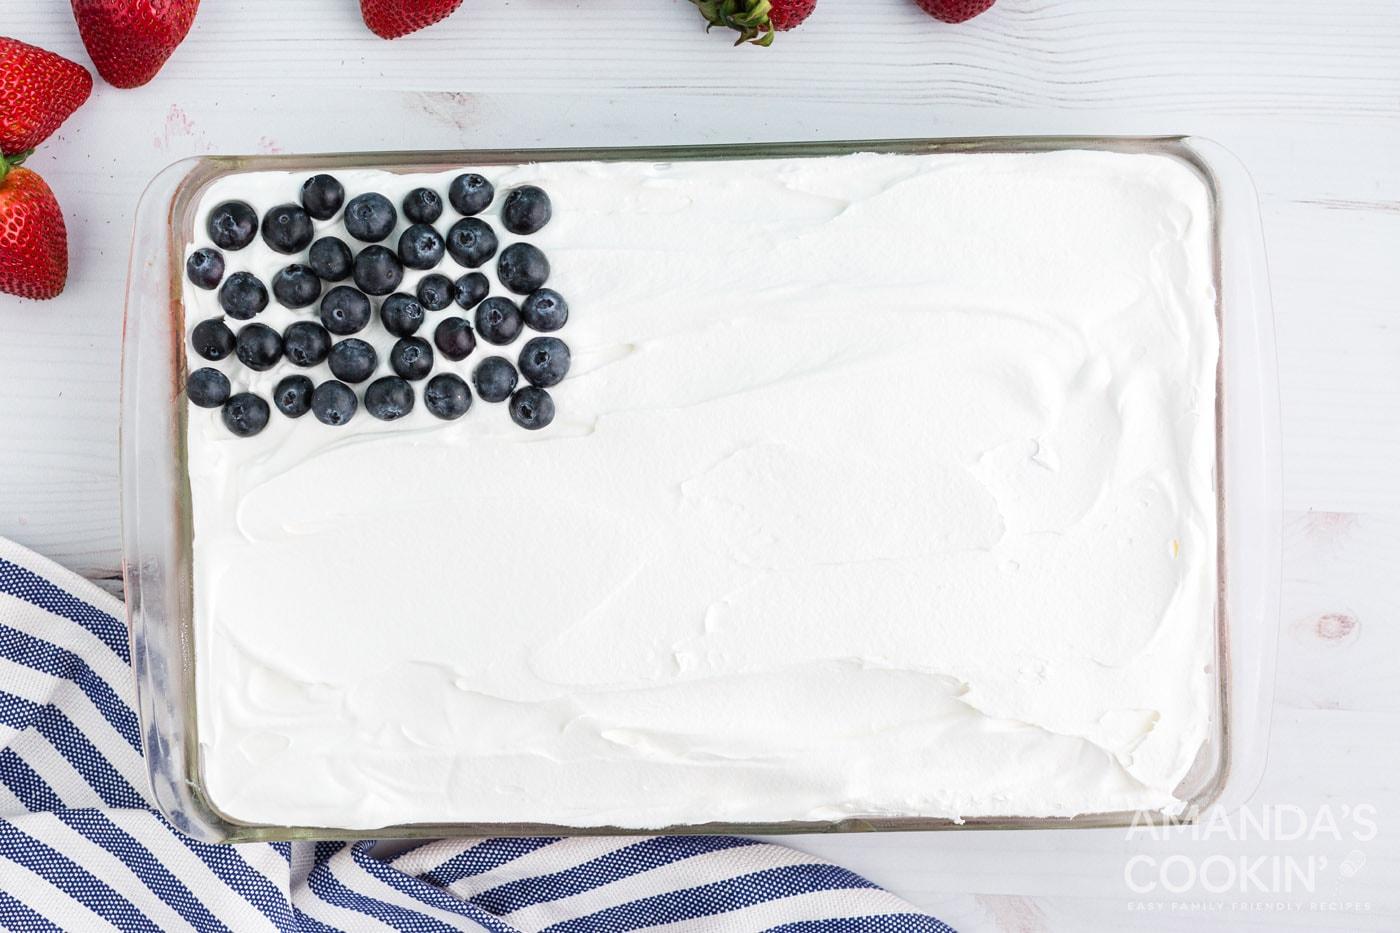 blueberries on top left corner of cake